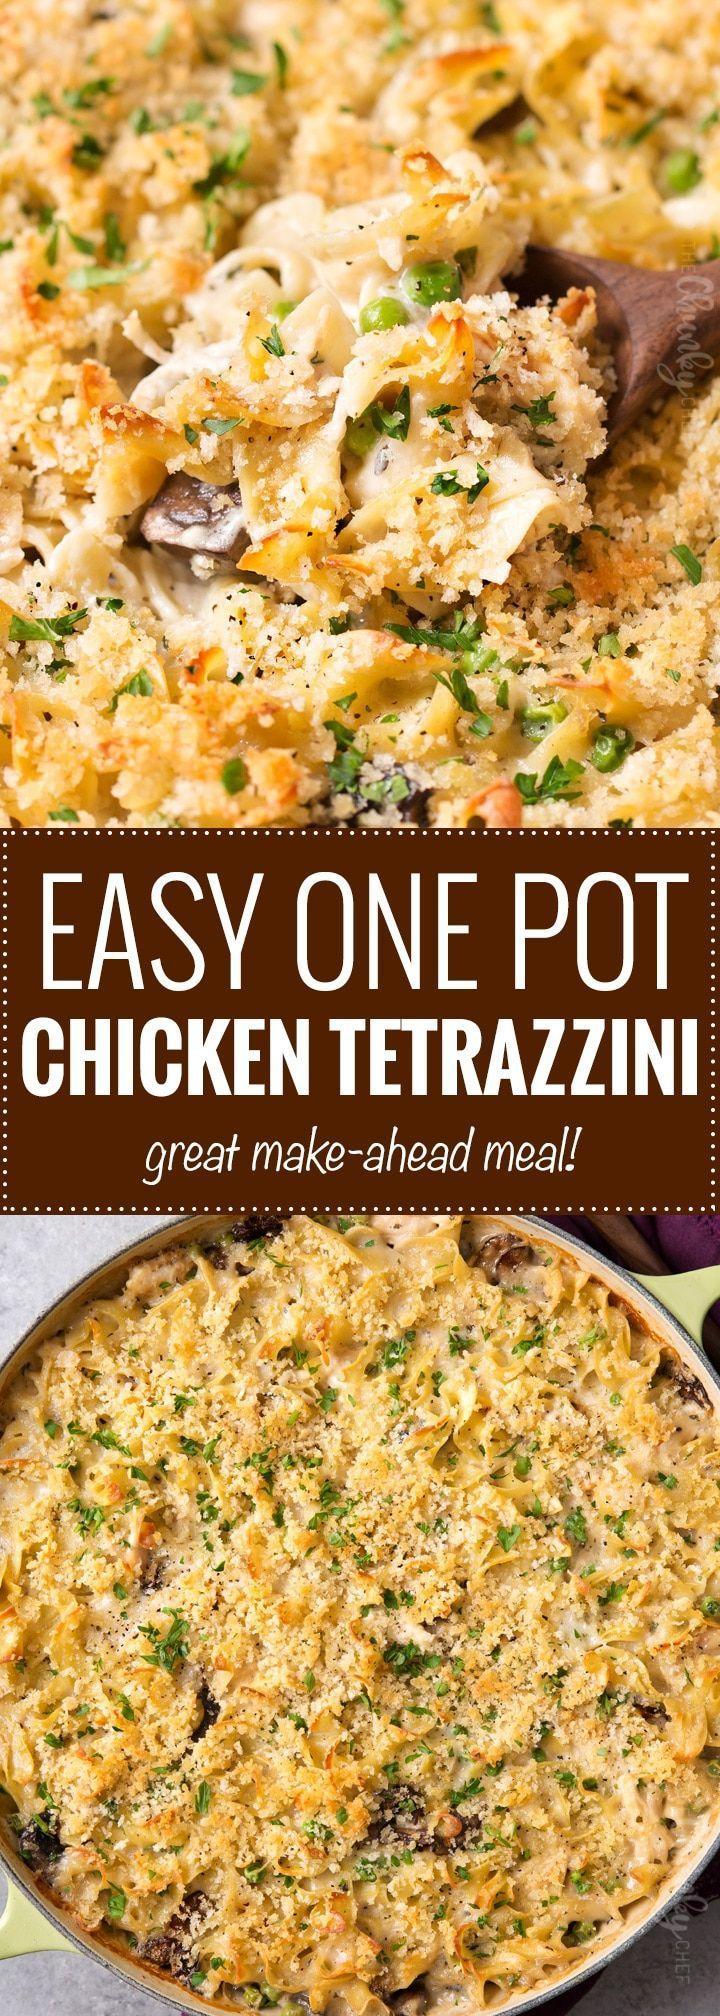 One Pot Chicken Tetrazzini | Posted By: DebbieNet.com